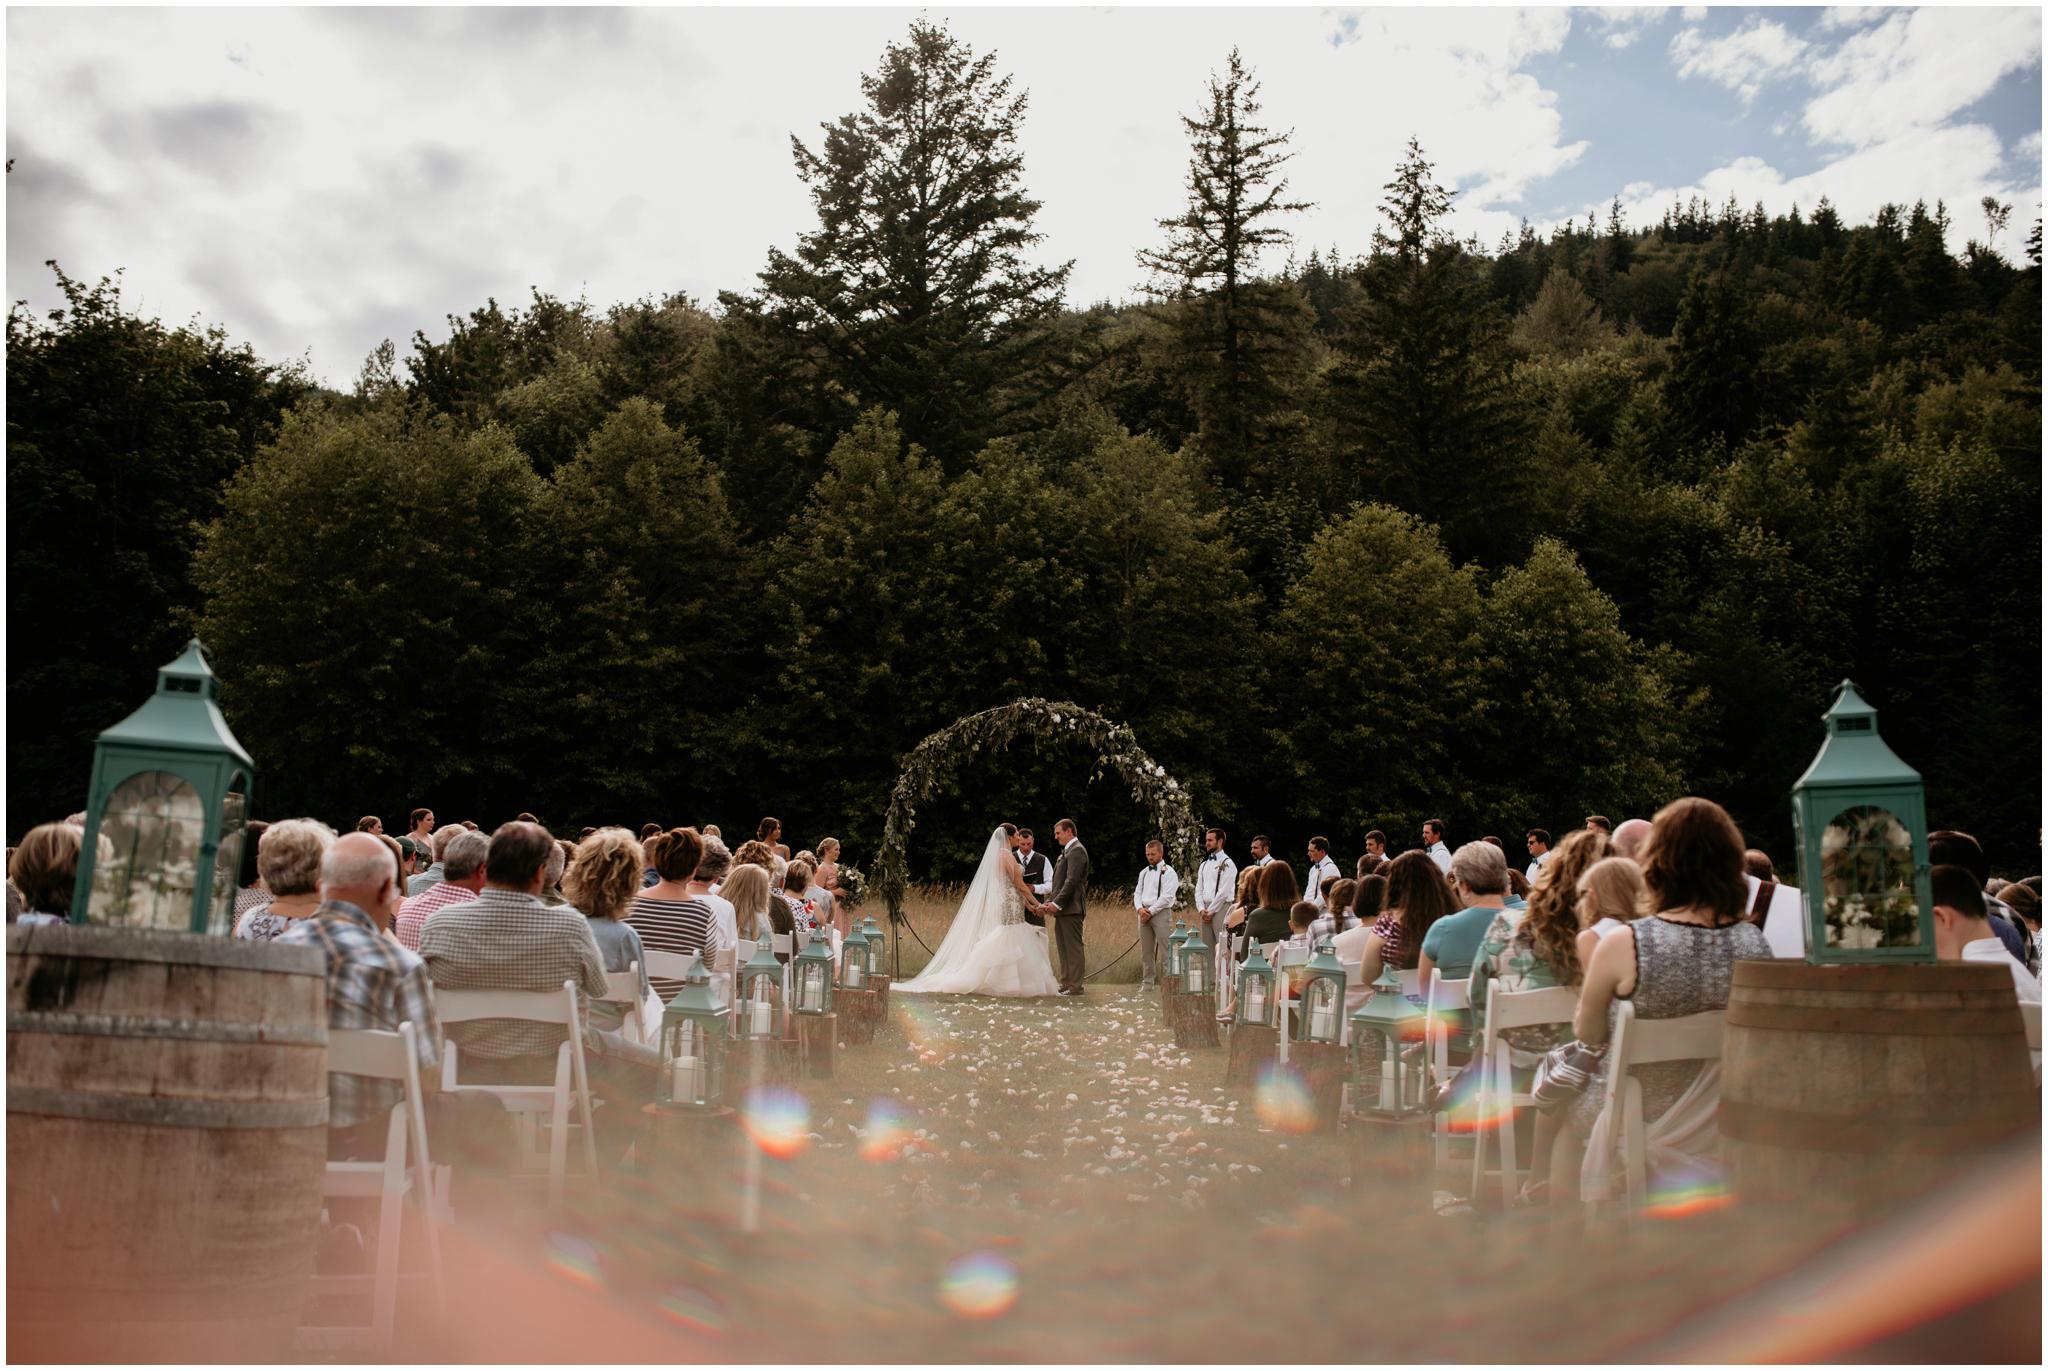 alex-and-matthew-three-cs-farm-venue-seattle-wedding-photographer-110.jpg